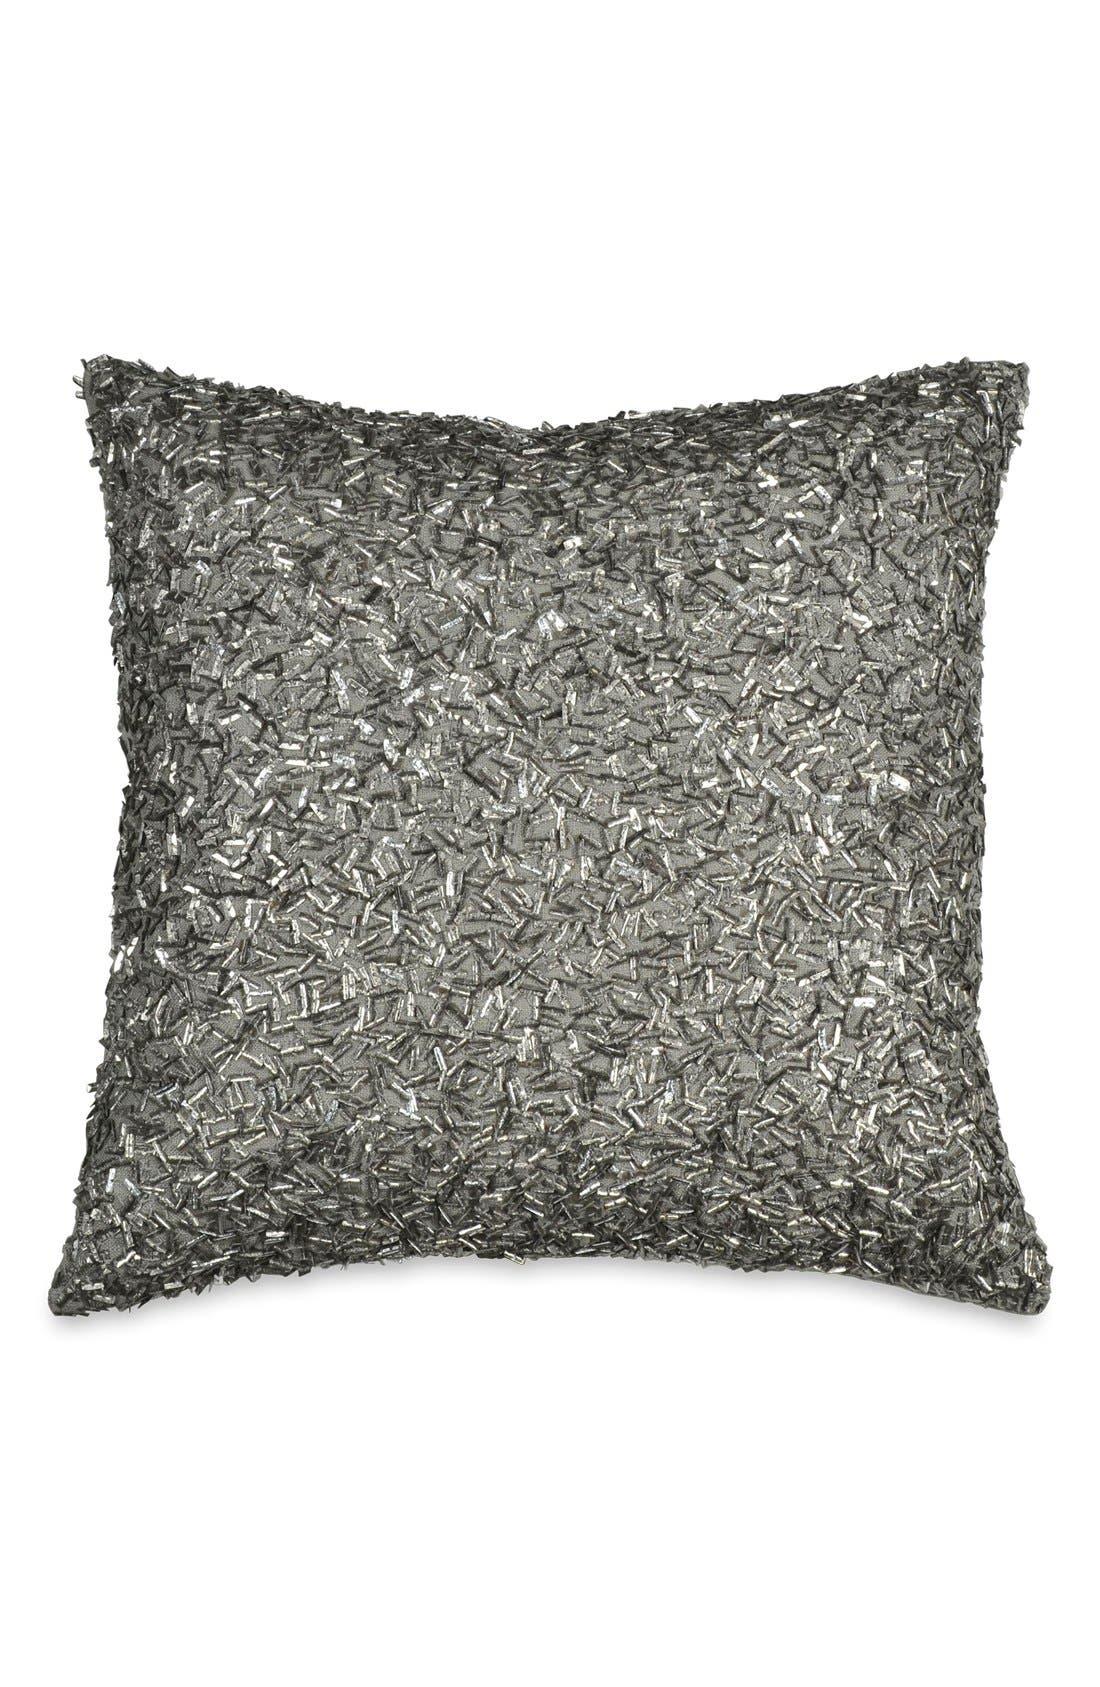 Alternate Image 1 Selected - Donna Karan Collection 'Exhale' Pillow